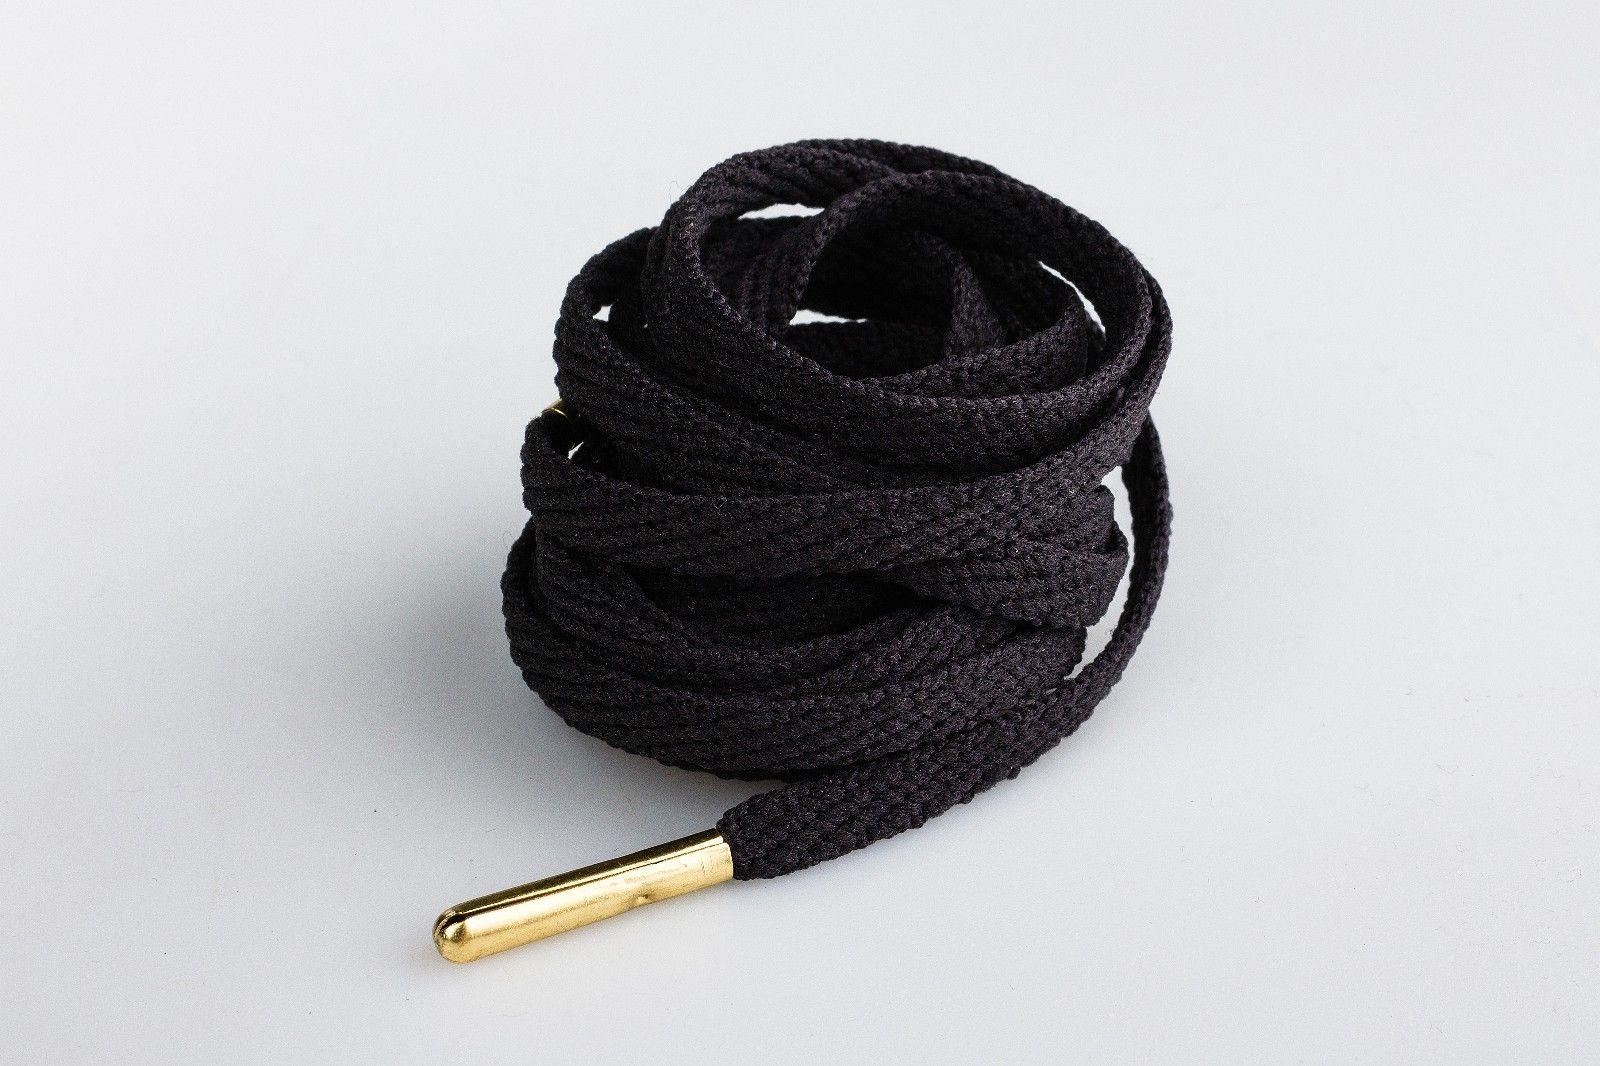 Skinnies Black Gold Tip- זוג שרוכים צרים בצבע שחור עם אגלט בצבע זהב